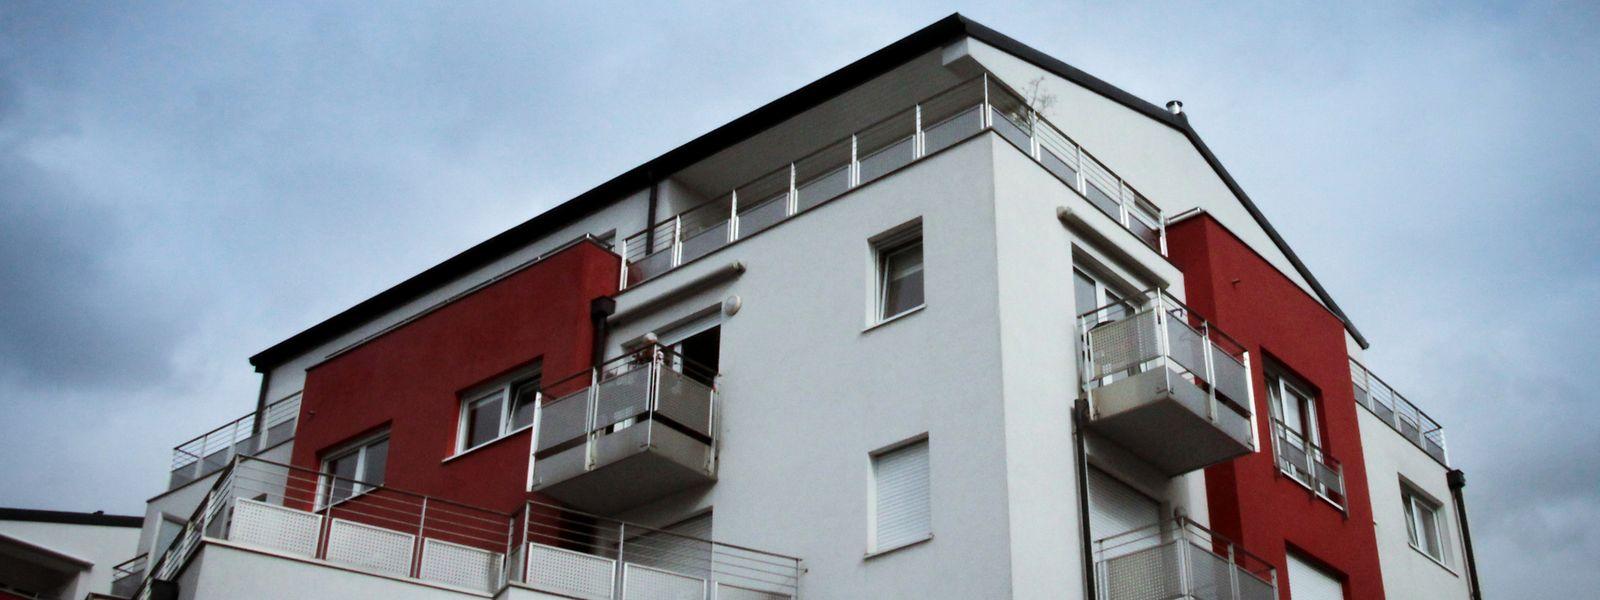 Der mutmaßliche Doppelmord geschah am 25. September 2016 auf dem Balkon eines Penthouse in Bereldingen.